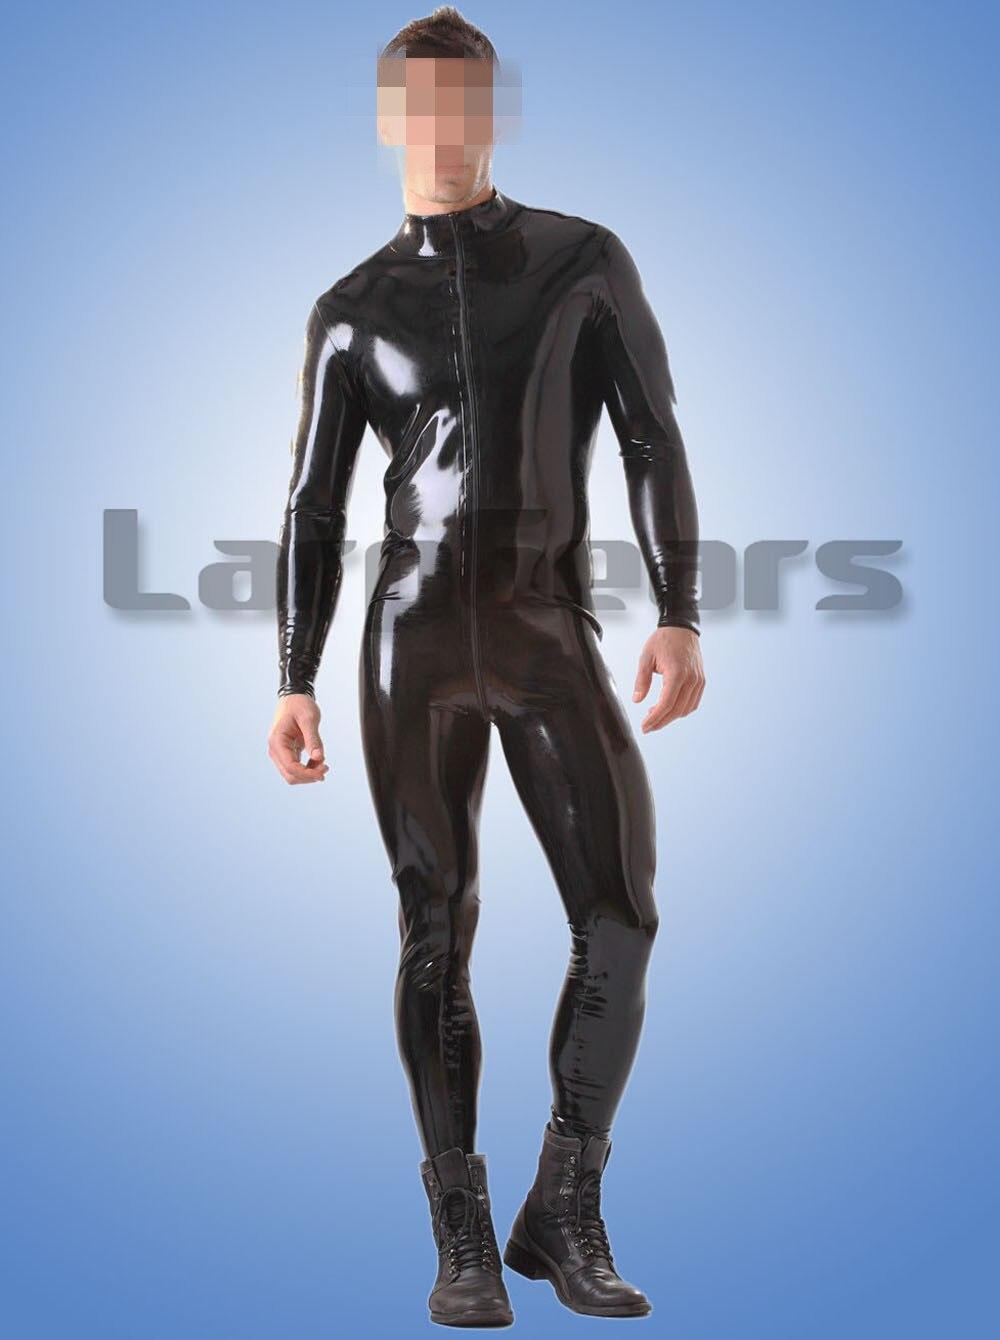 100 Latex Rubber Gummi Zentai Catsuit 0 4mm Fetish Man Latex Bodysuit Suit Wear